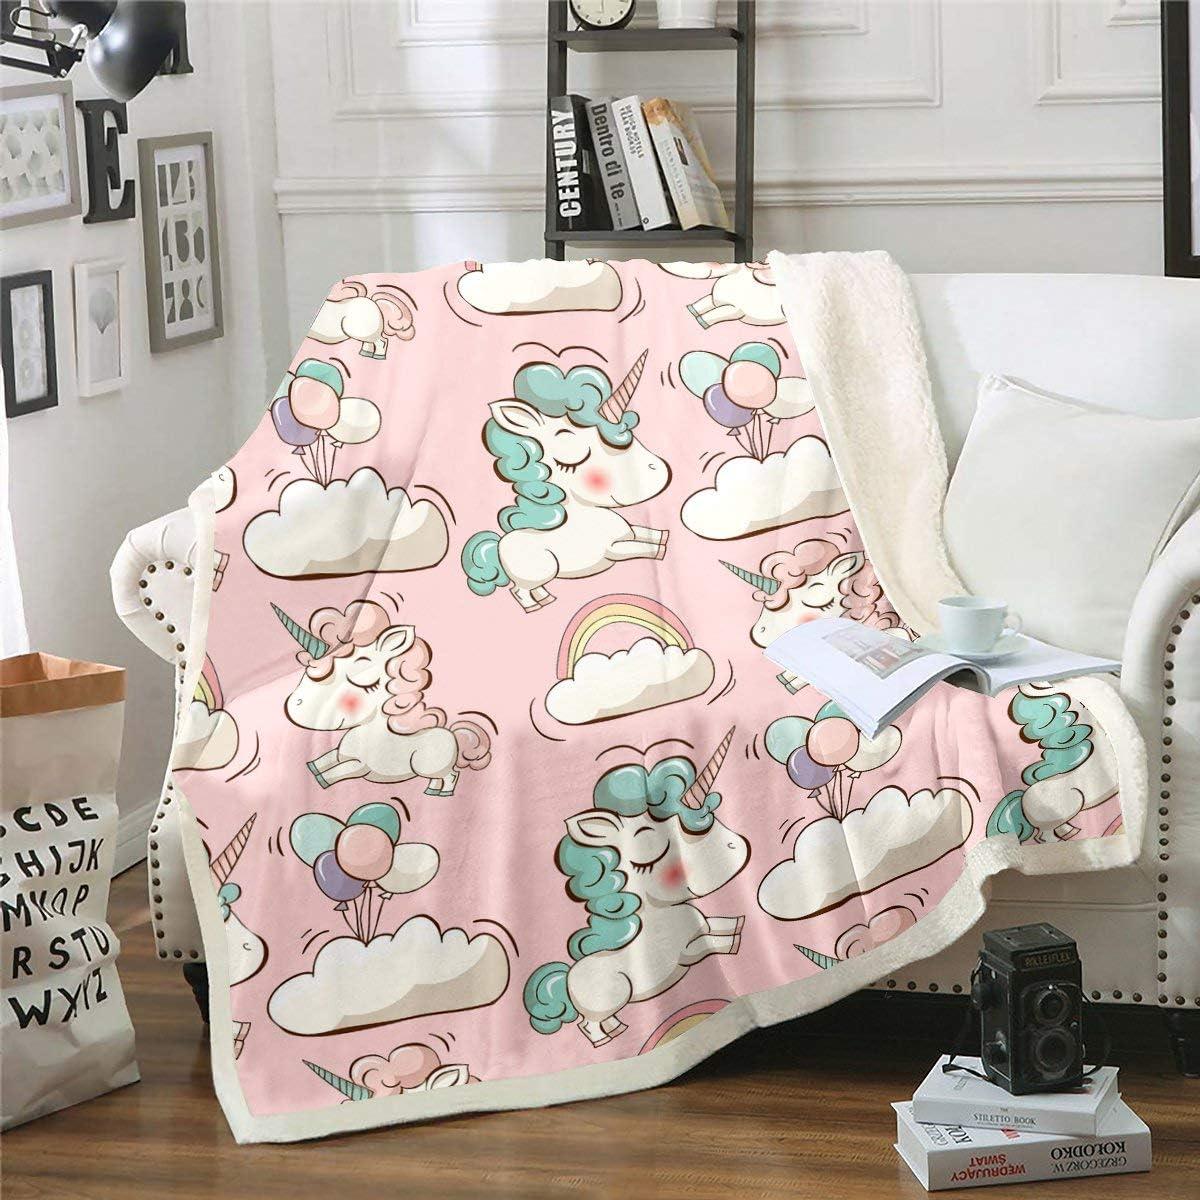 Feelyou Pink Purchase Unicorn service Fleece Throw Blanket Kids for Girls Toddler